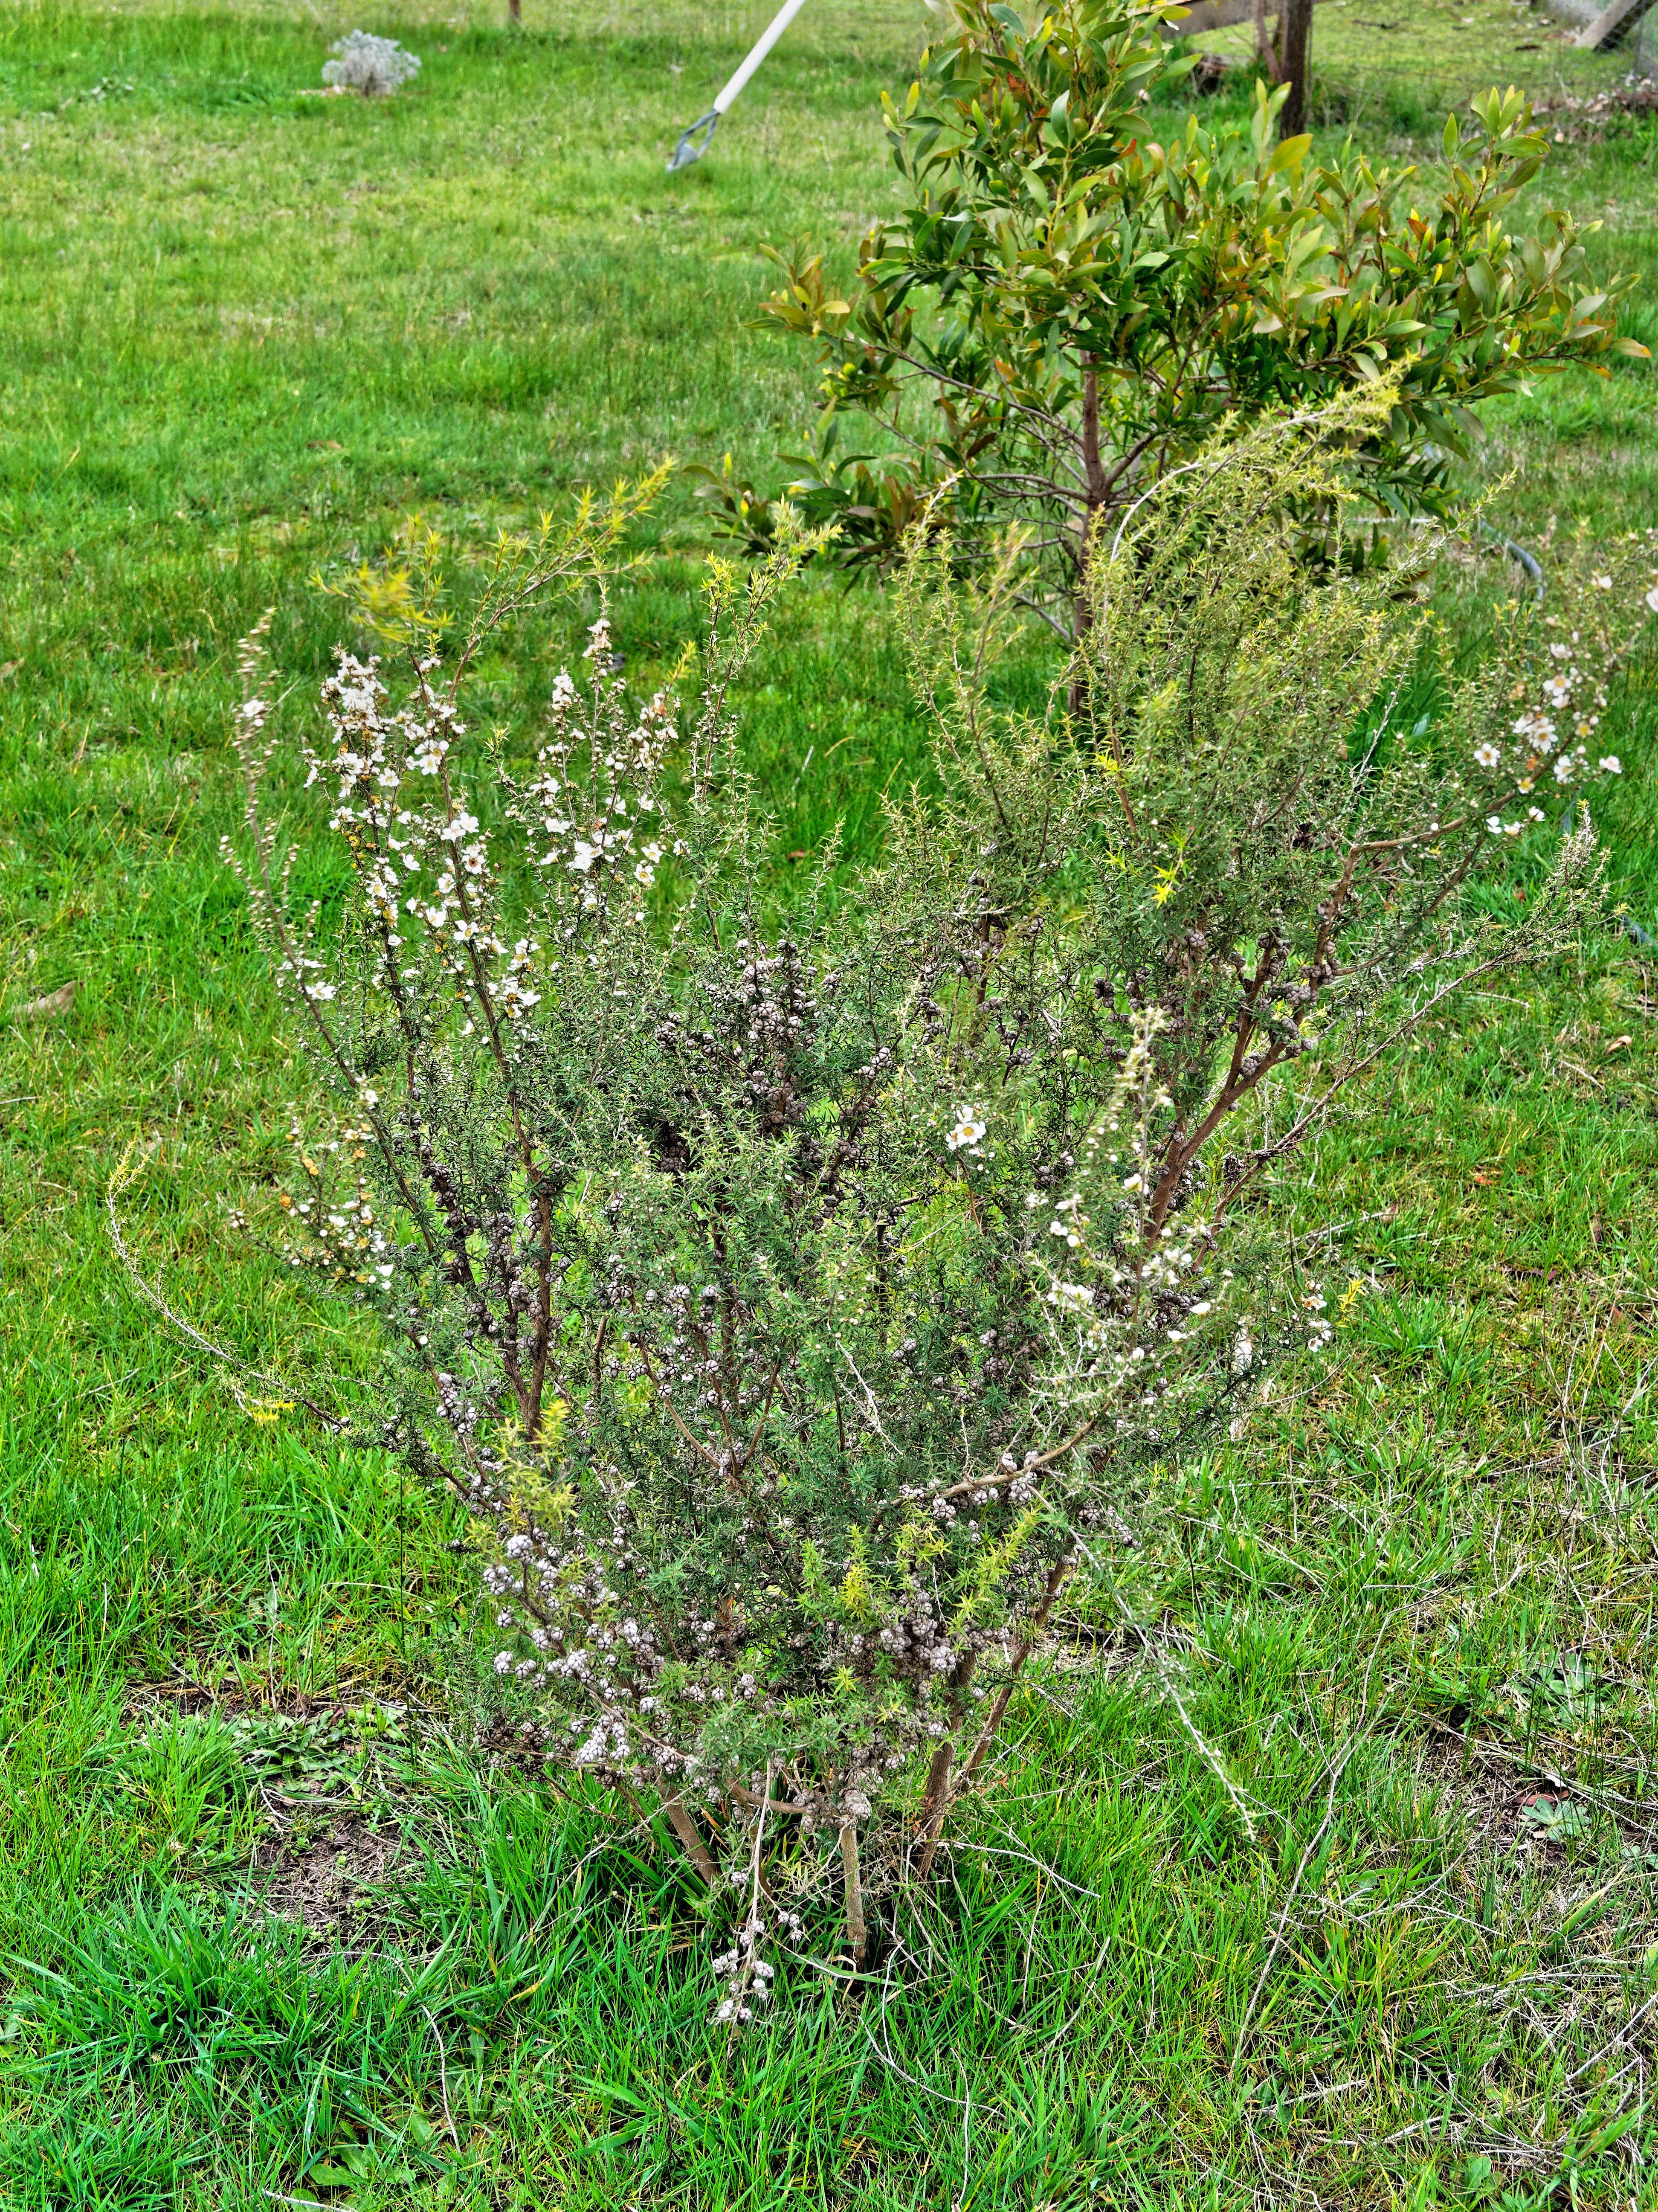 Leptospermum.jpeg